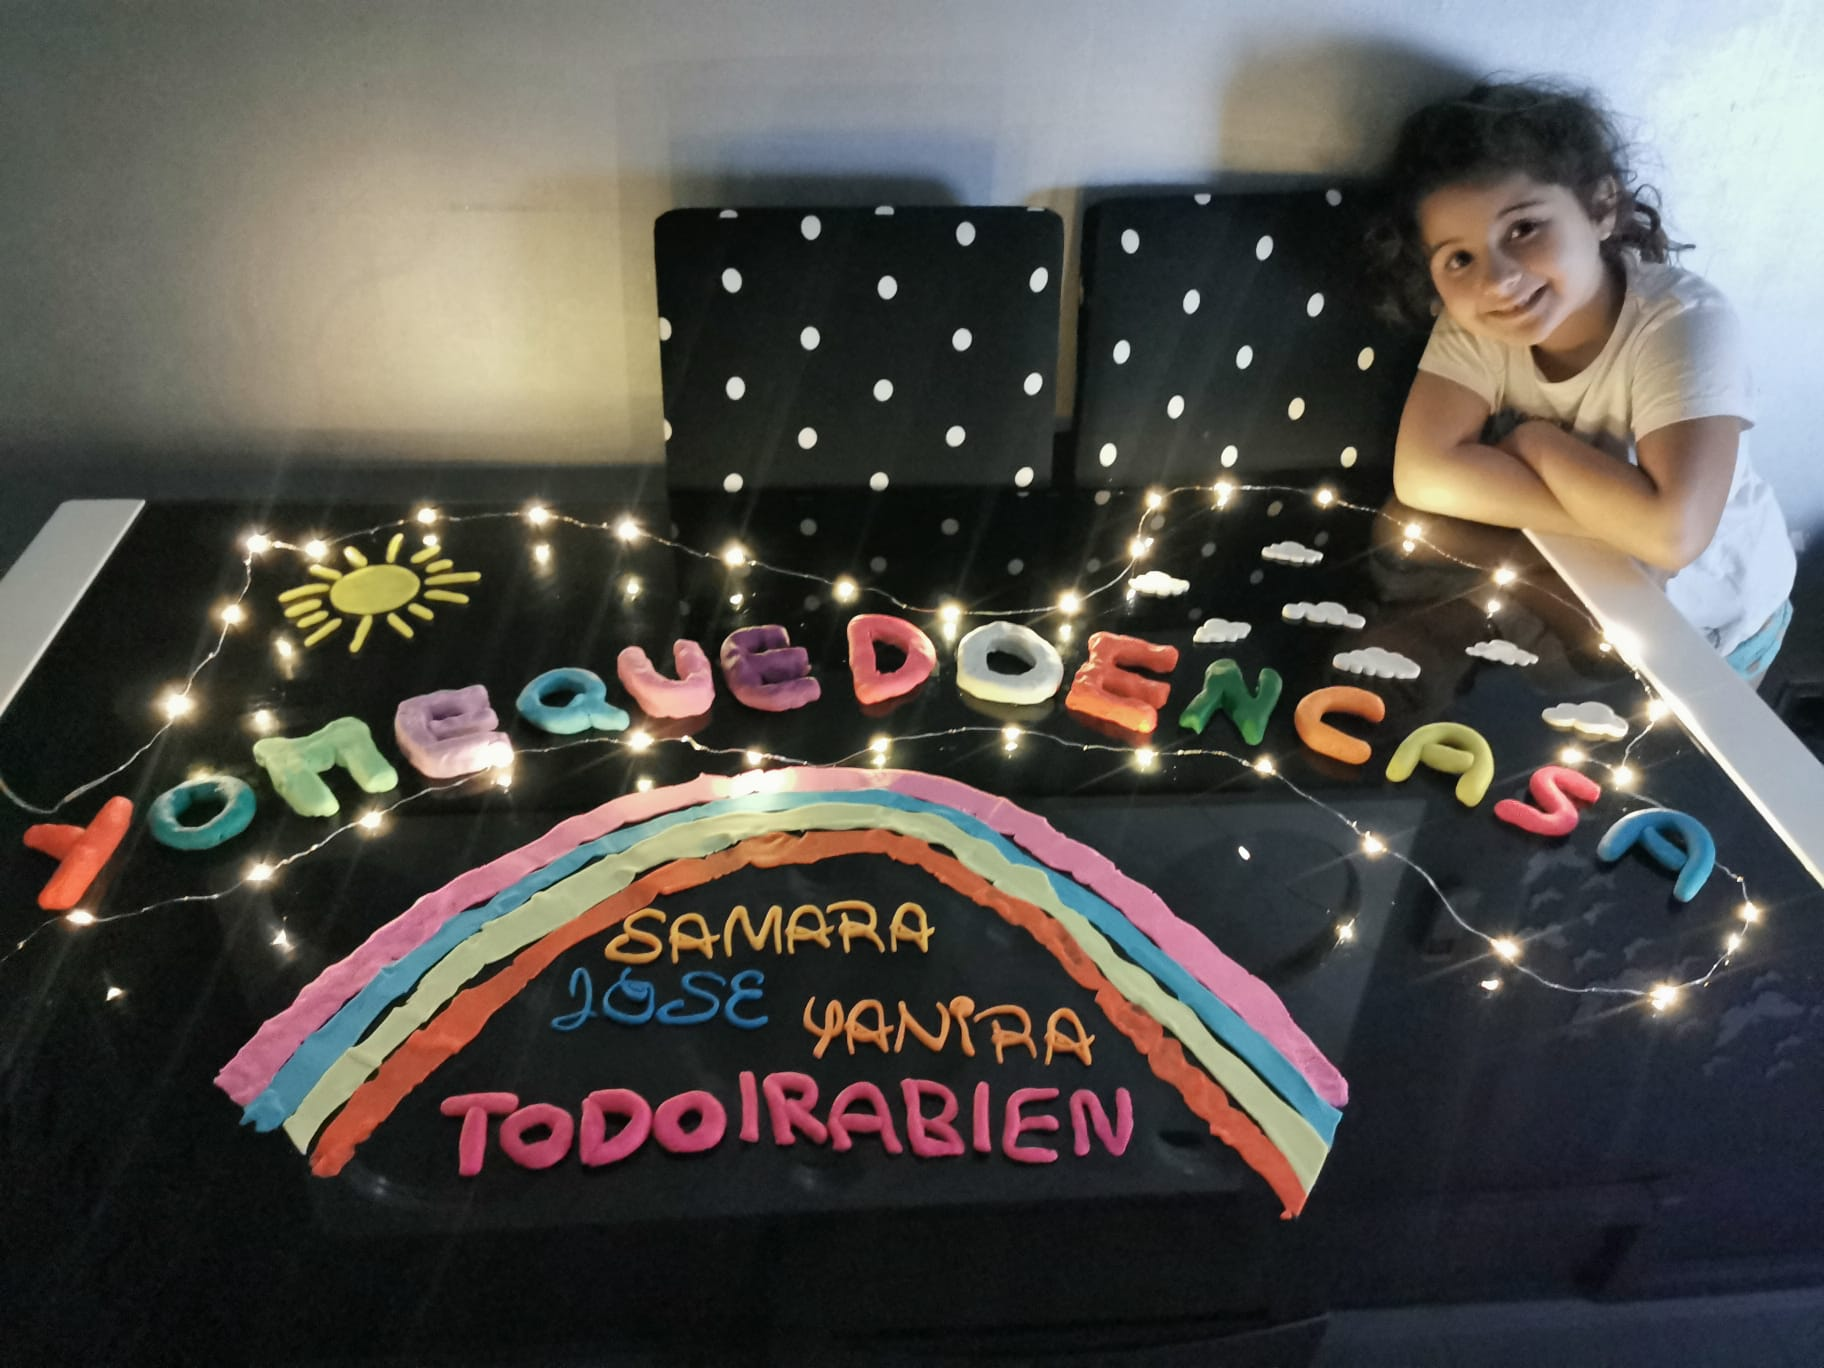 Samara jose y Yanira Zona Franca